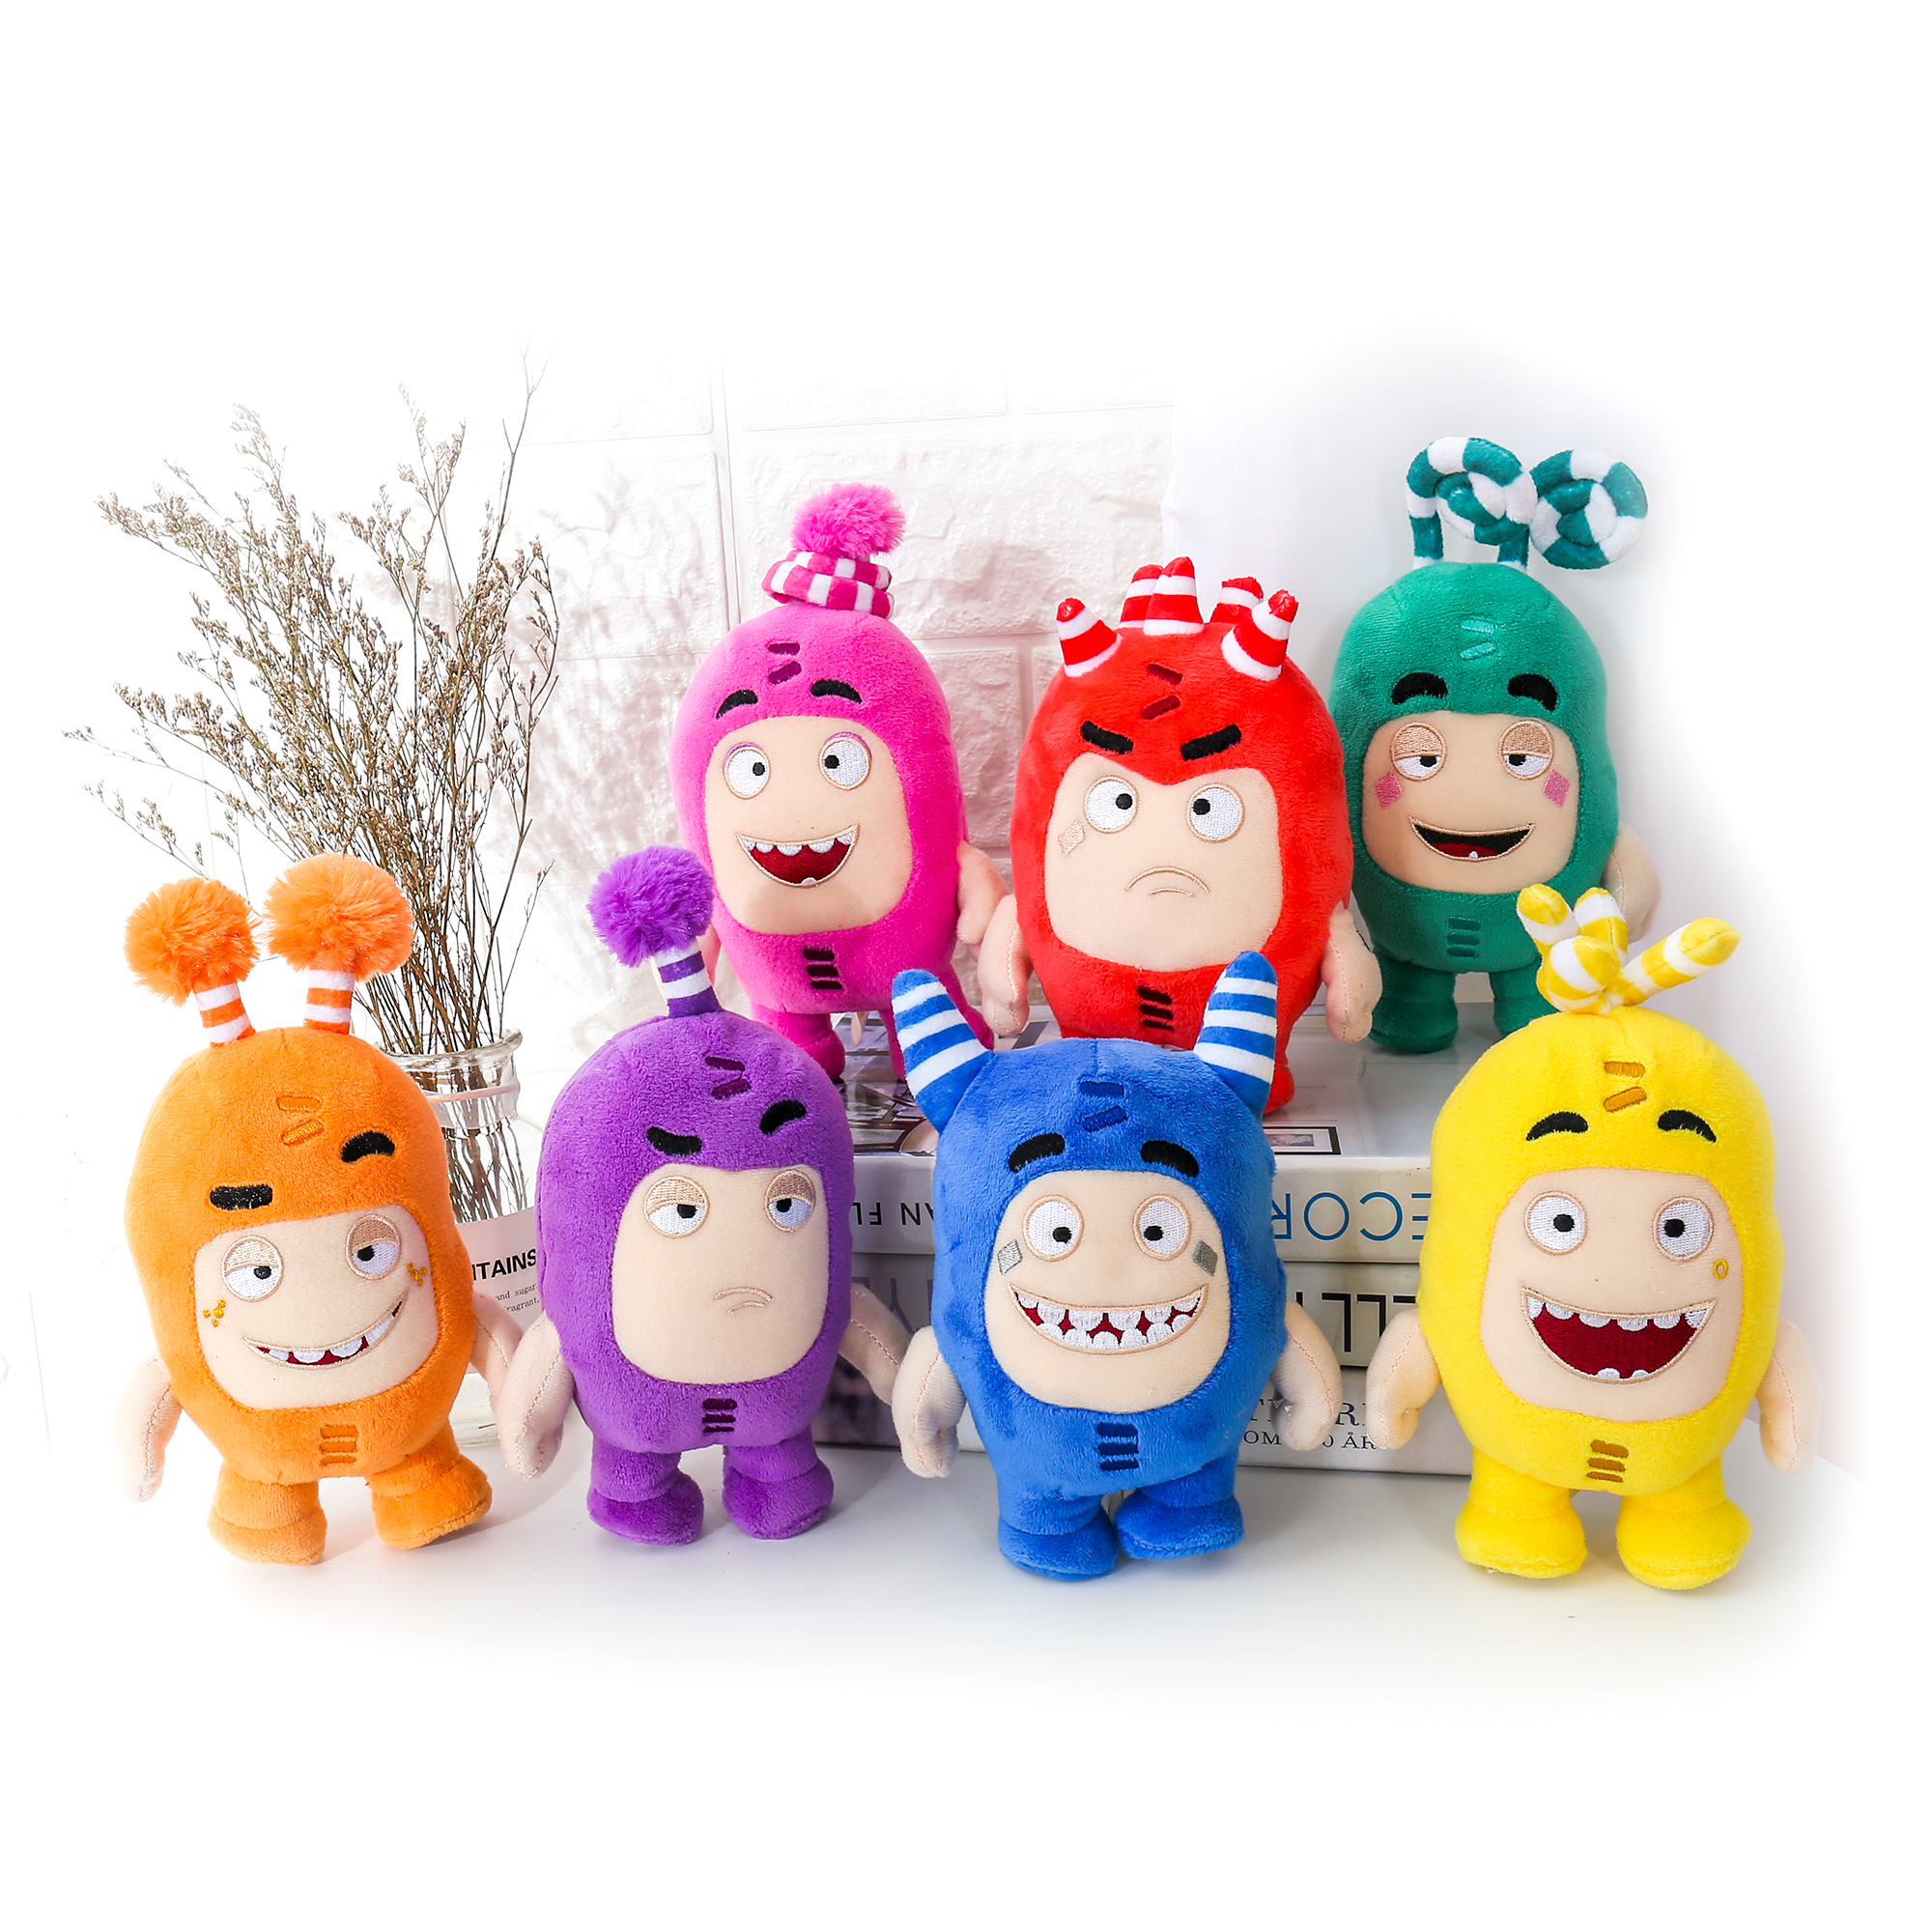 15-17CM 8 Style Oddbods Plush Toy Oddbods Monster Stuffed Dolls Treasure Of Soldiers Monster Doll Buuble Pogo Zee Birthday Gift